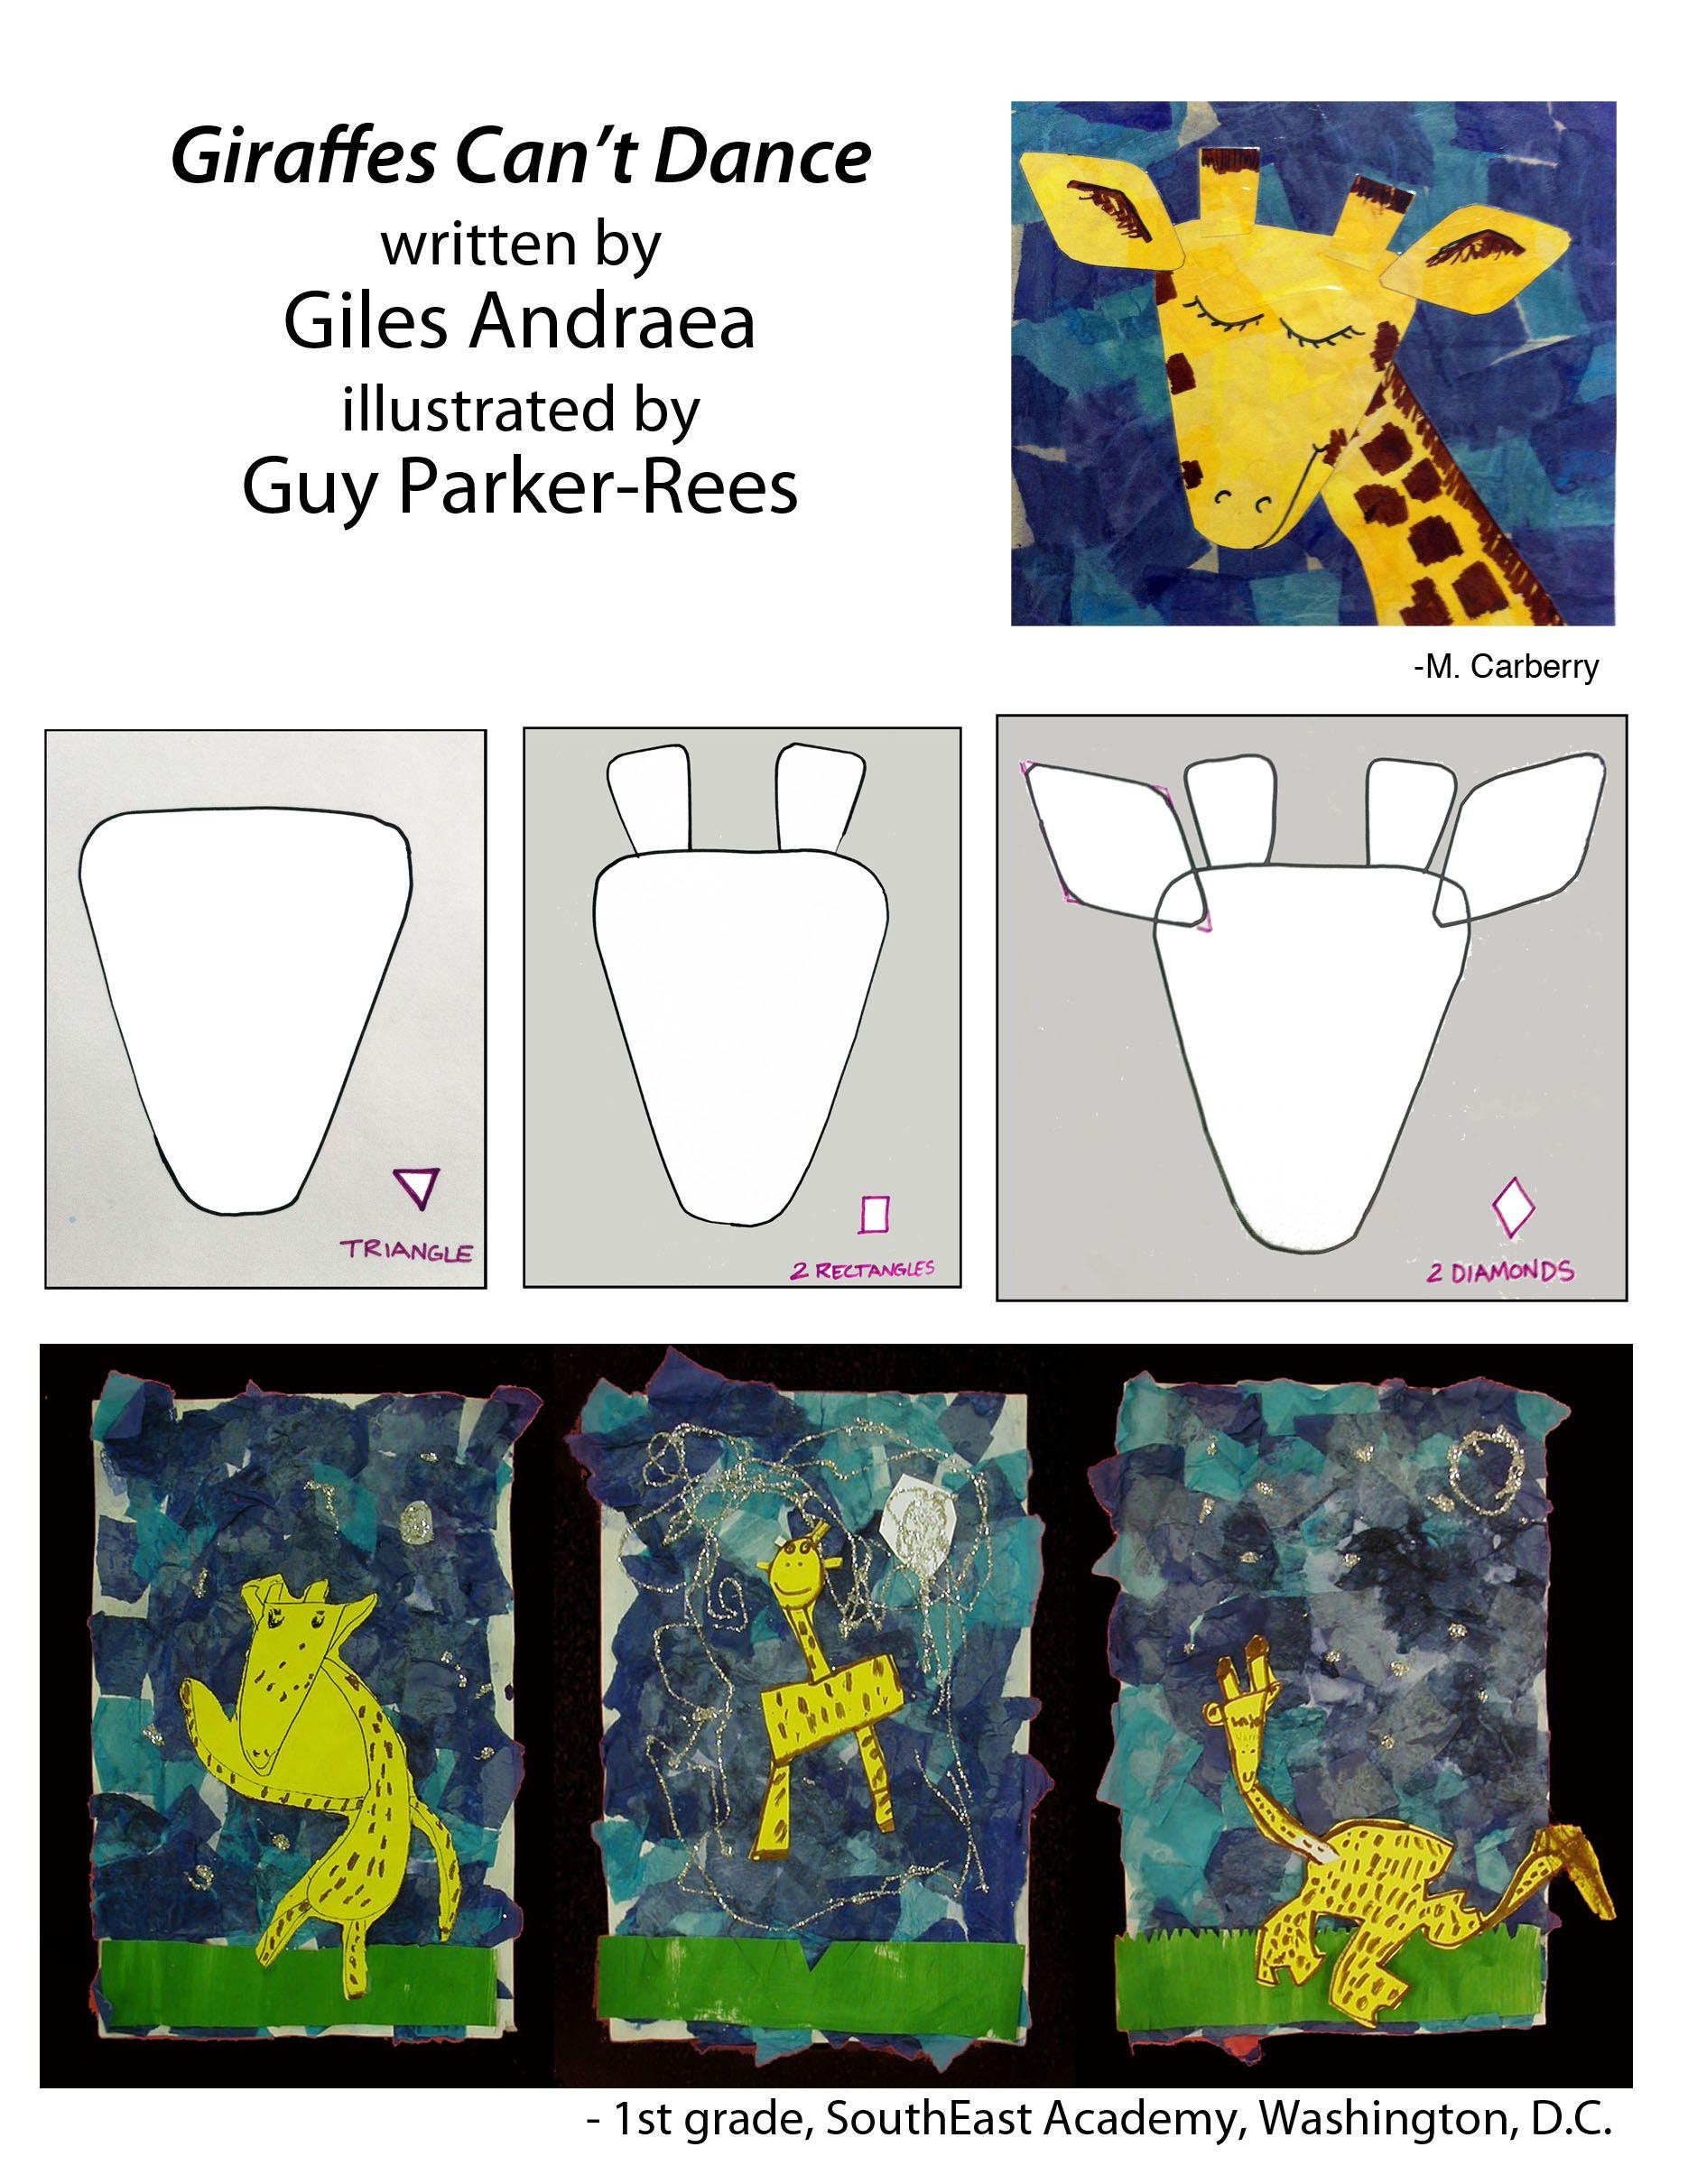 1st Grade Inspired By Giraffes Can T Dance Brown Marker On Yellow Construction Paper Tissue Collage Background Giraffes Cant Dance Kids Art Class Giraffe [ 2420 x 1870 Pixel ]